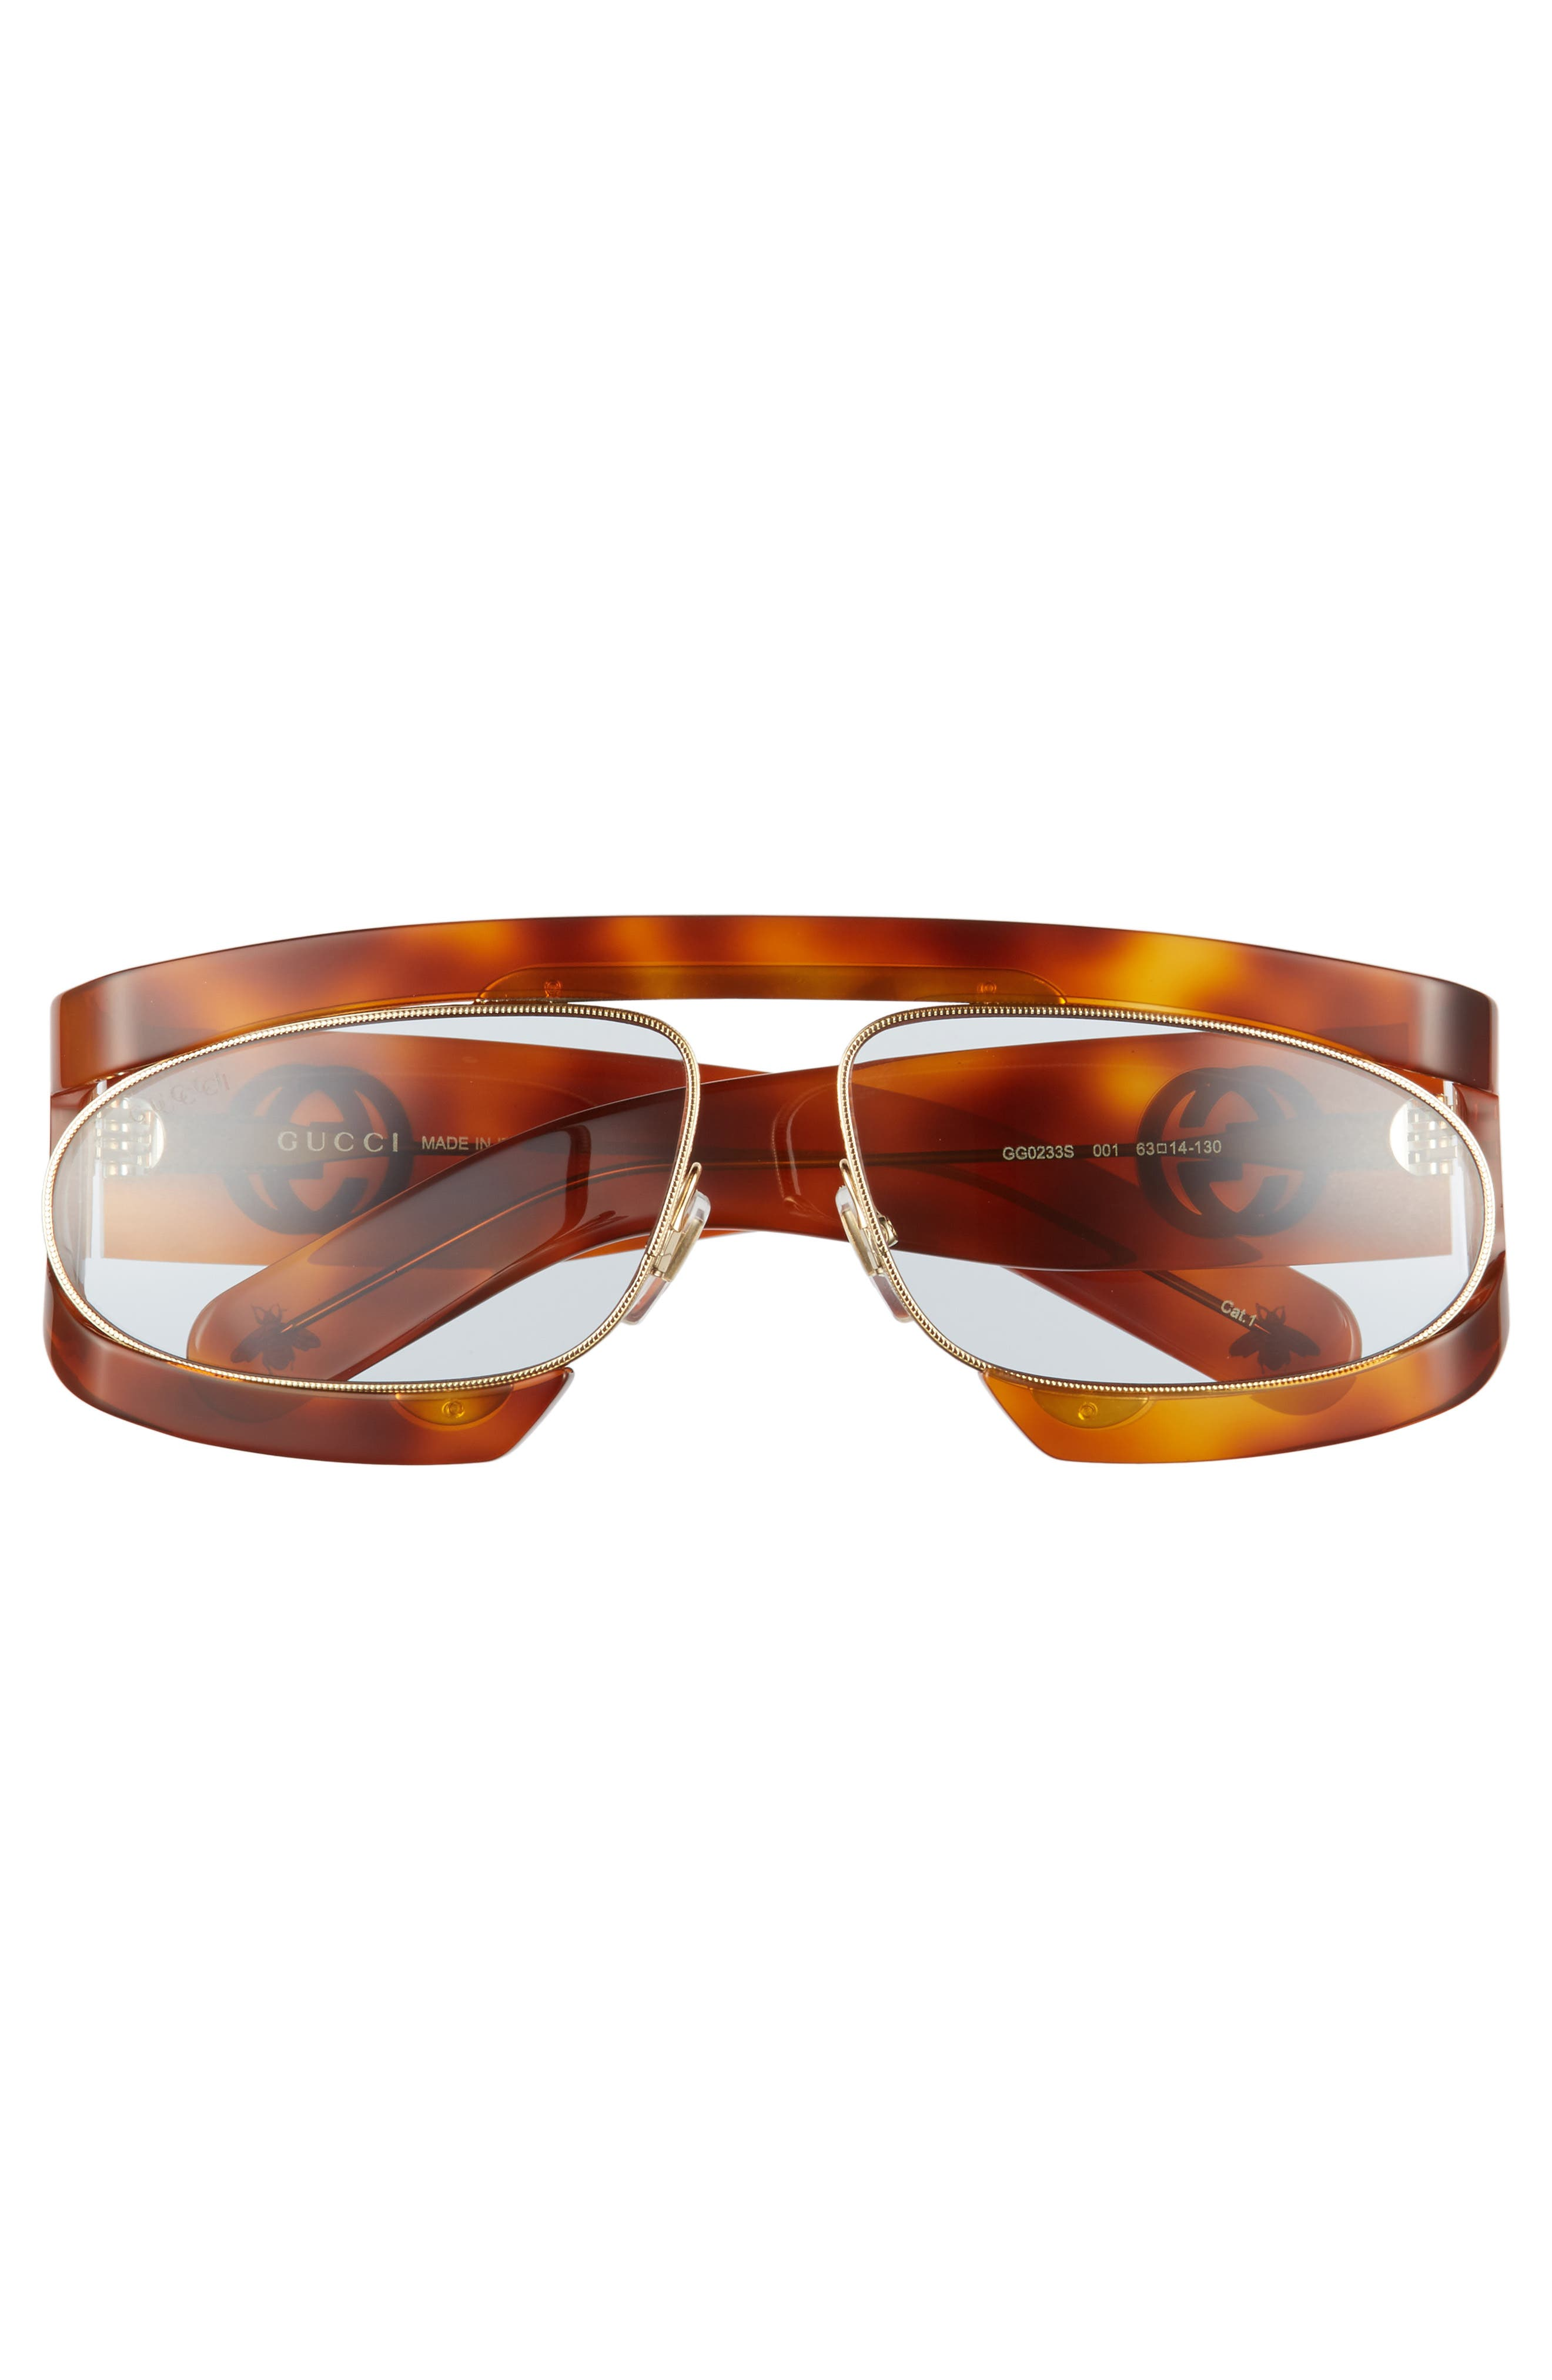 63mm Shield Glasses,                             Alternate thumbnail 3, color,                             200